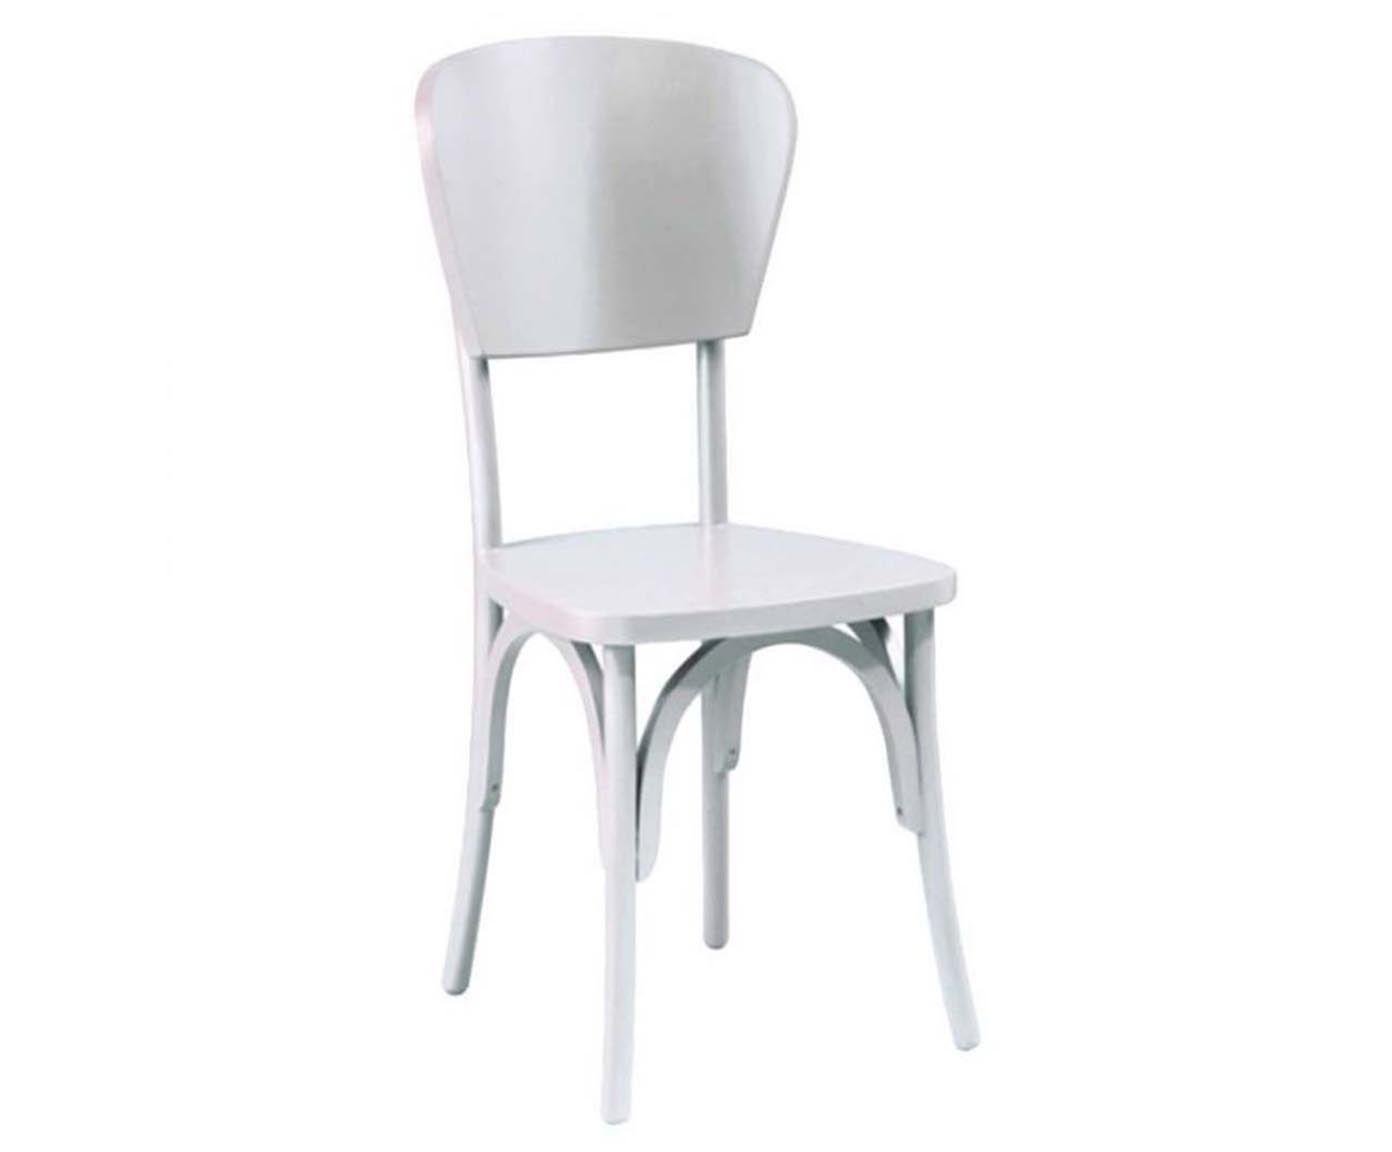 Cadeira romarin plank - union | Westwing.com.br